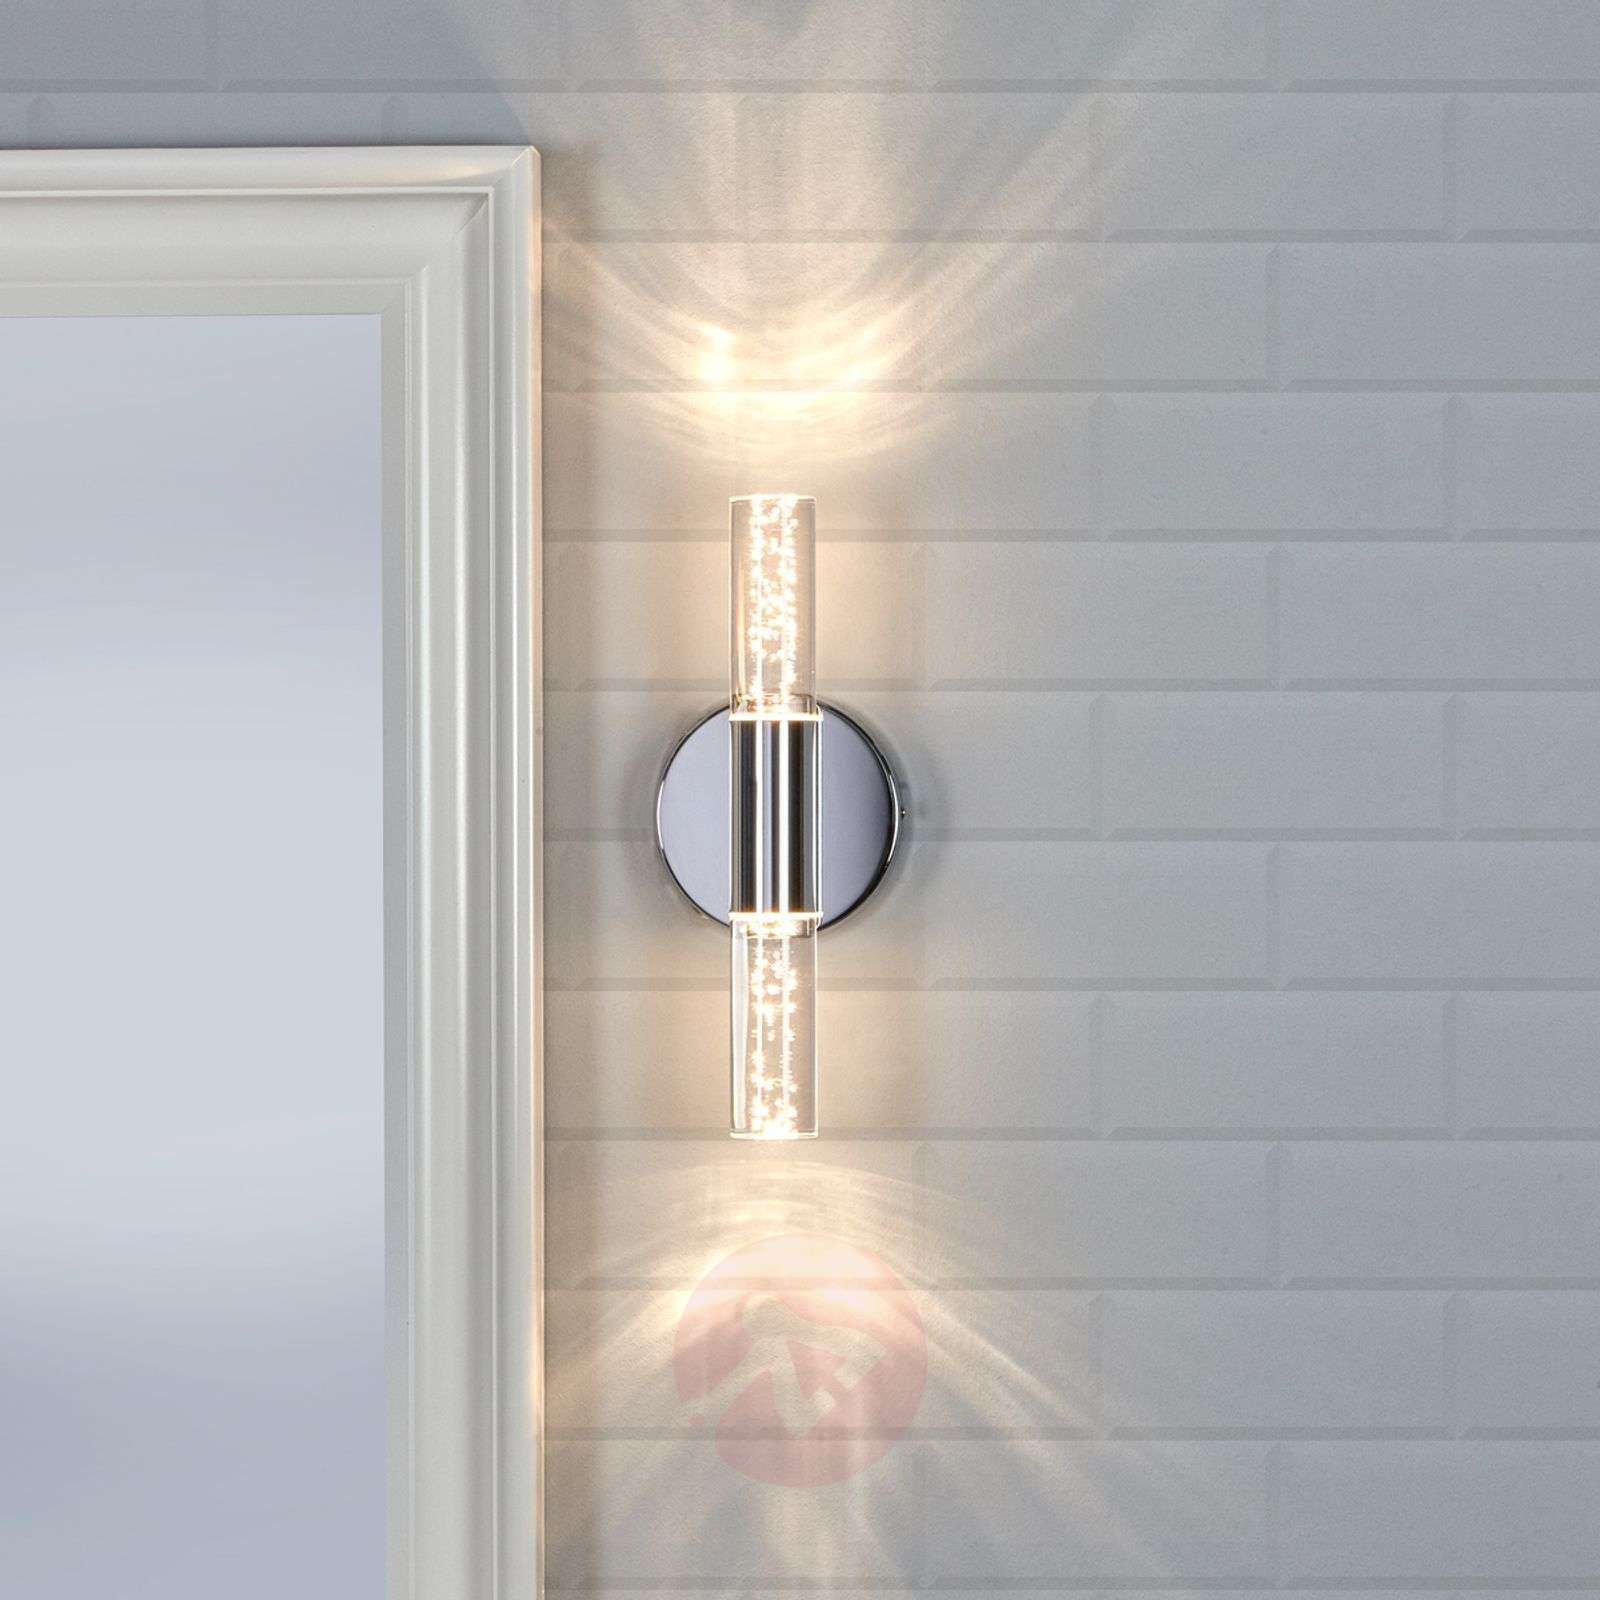 Duncan LED wall light for the bathroom-9994058-03